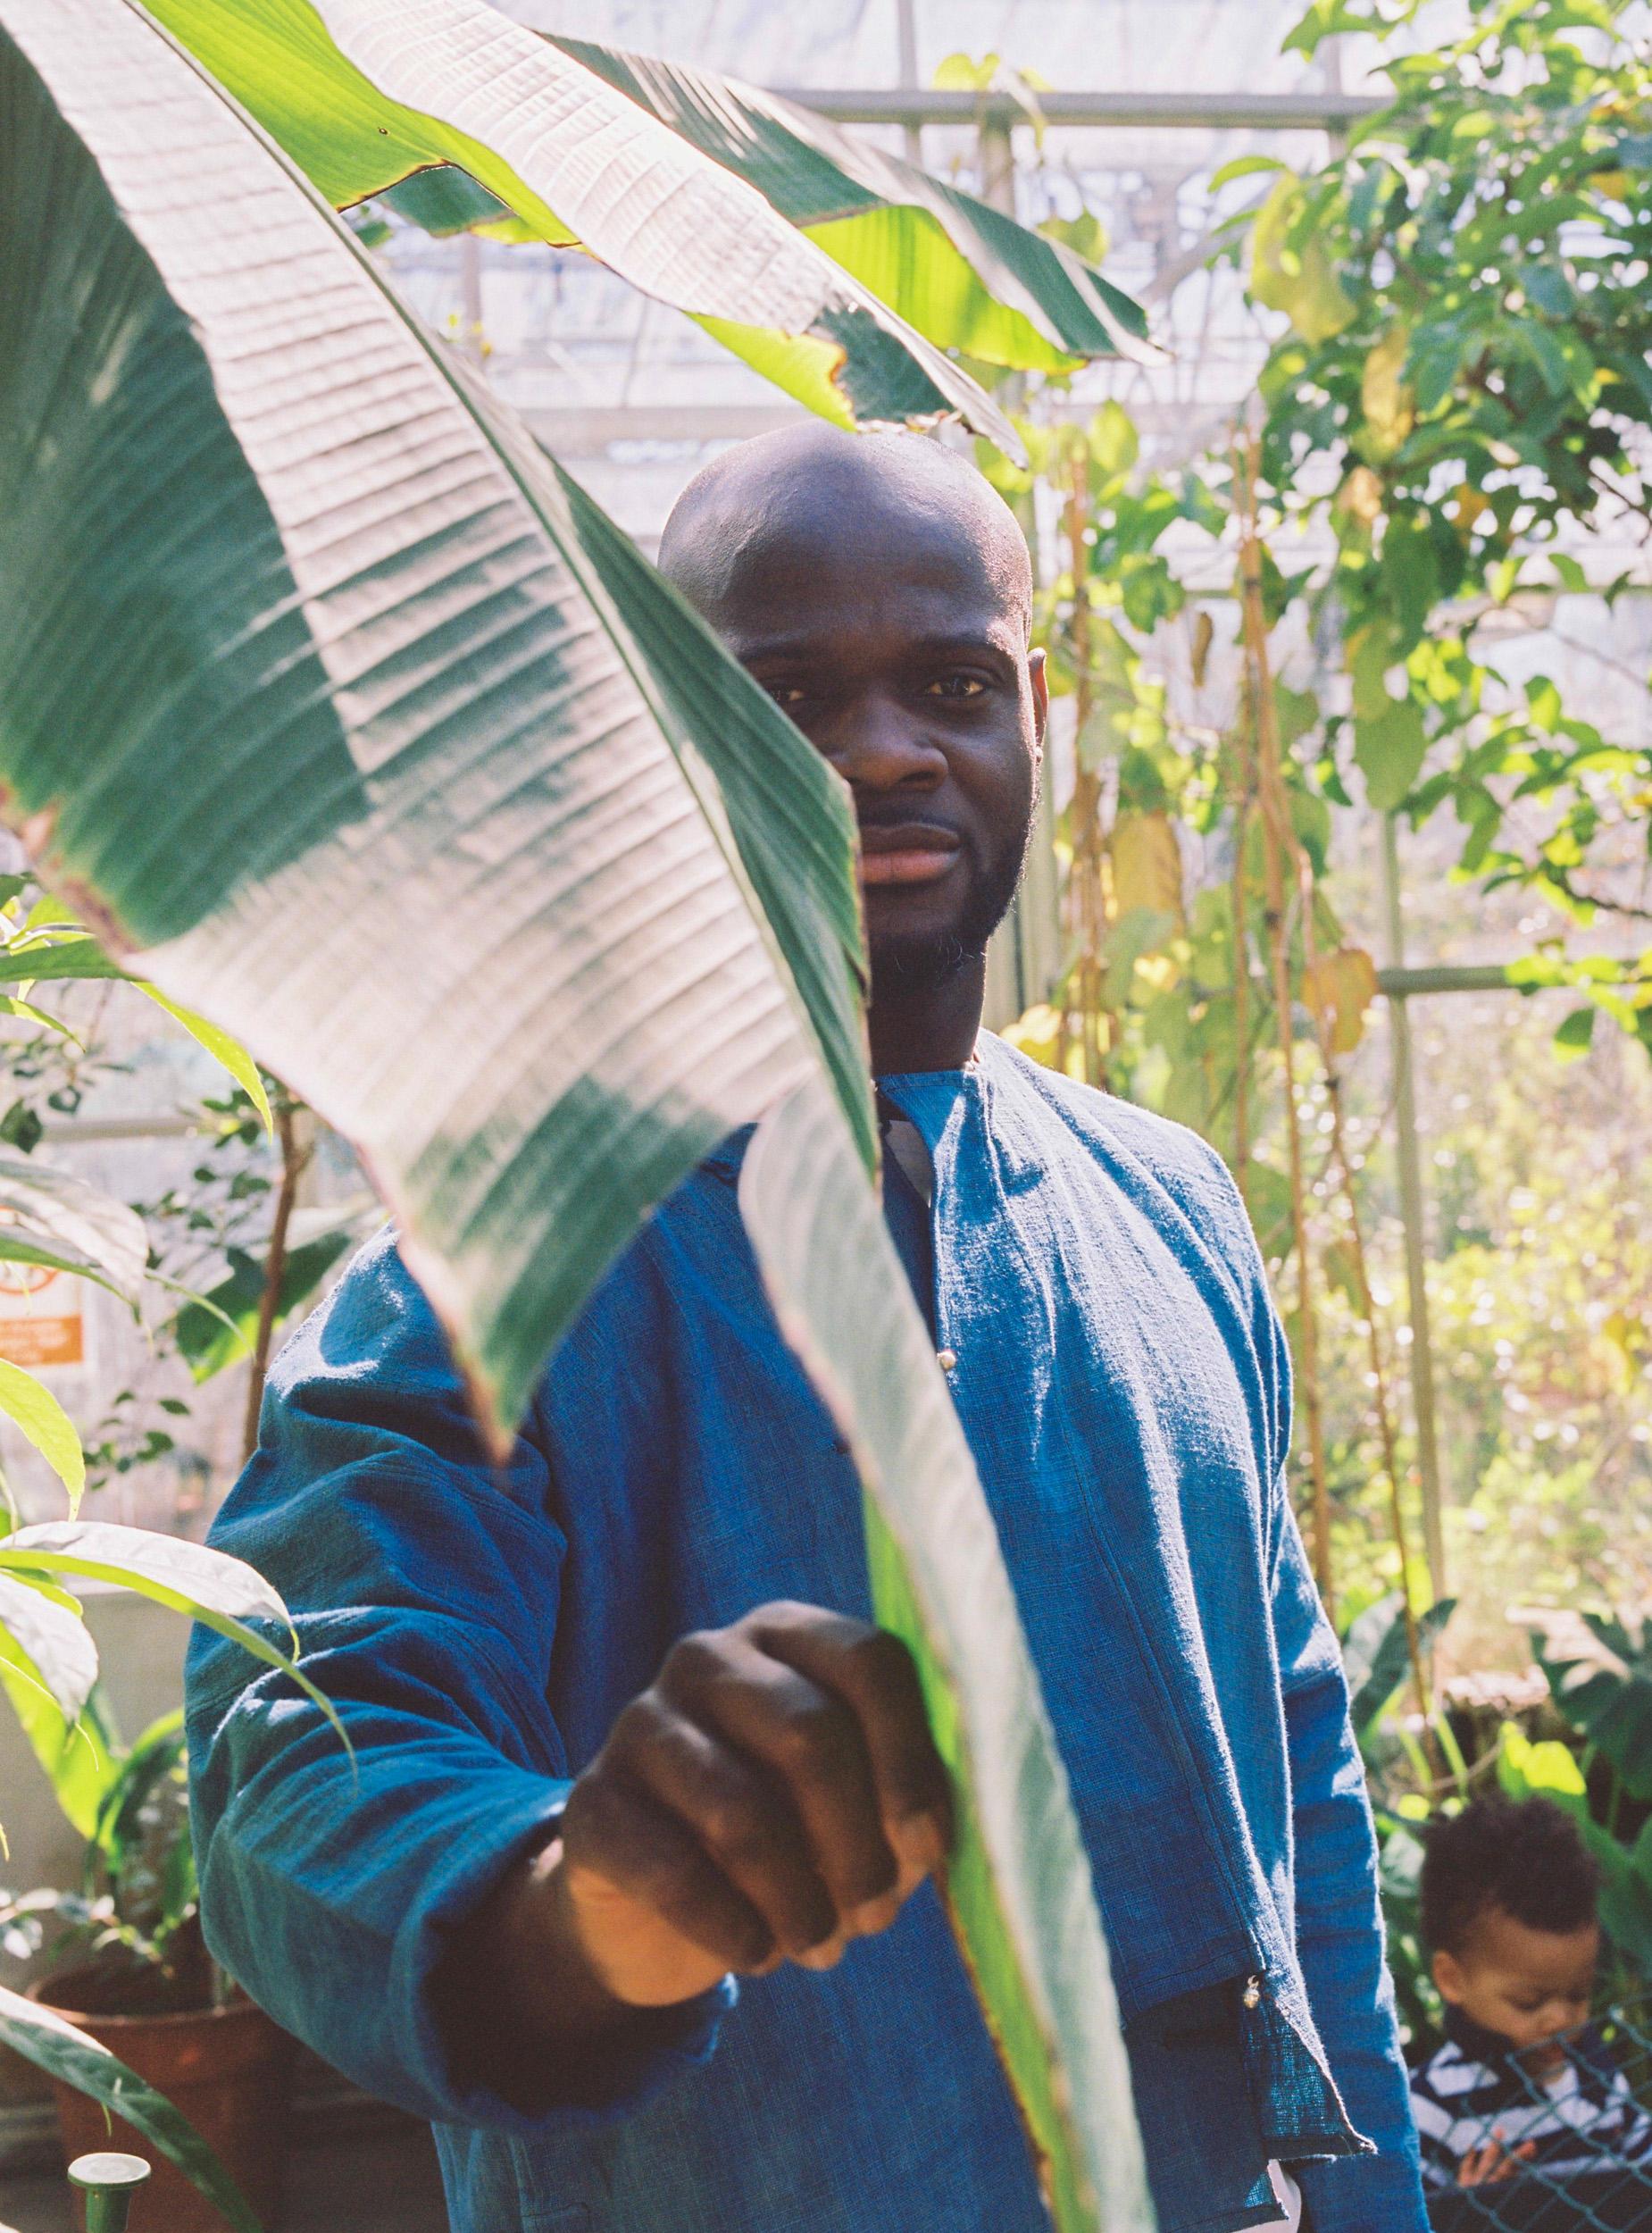 J0180_Tamay&Me_Botanical_Gallery-4.jpg